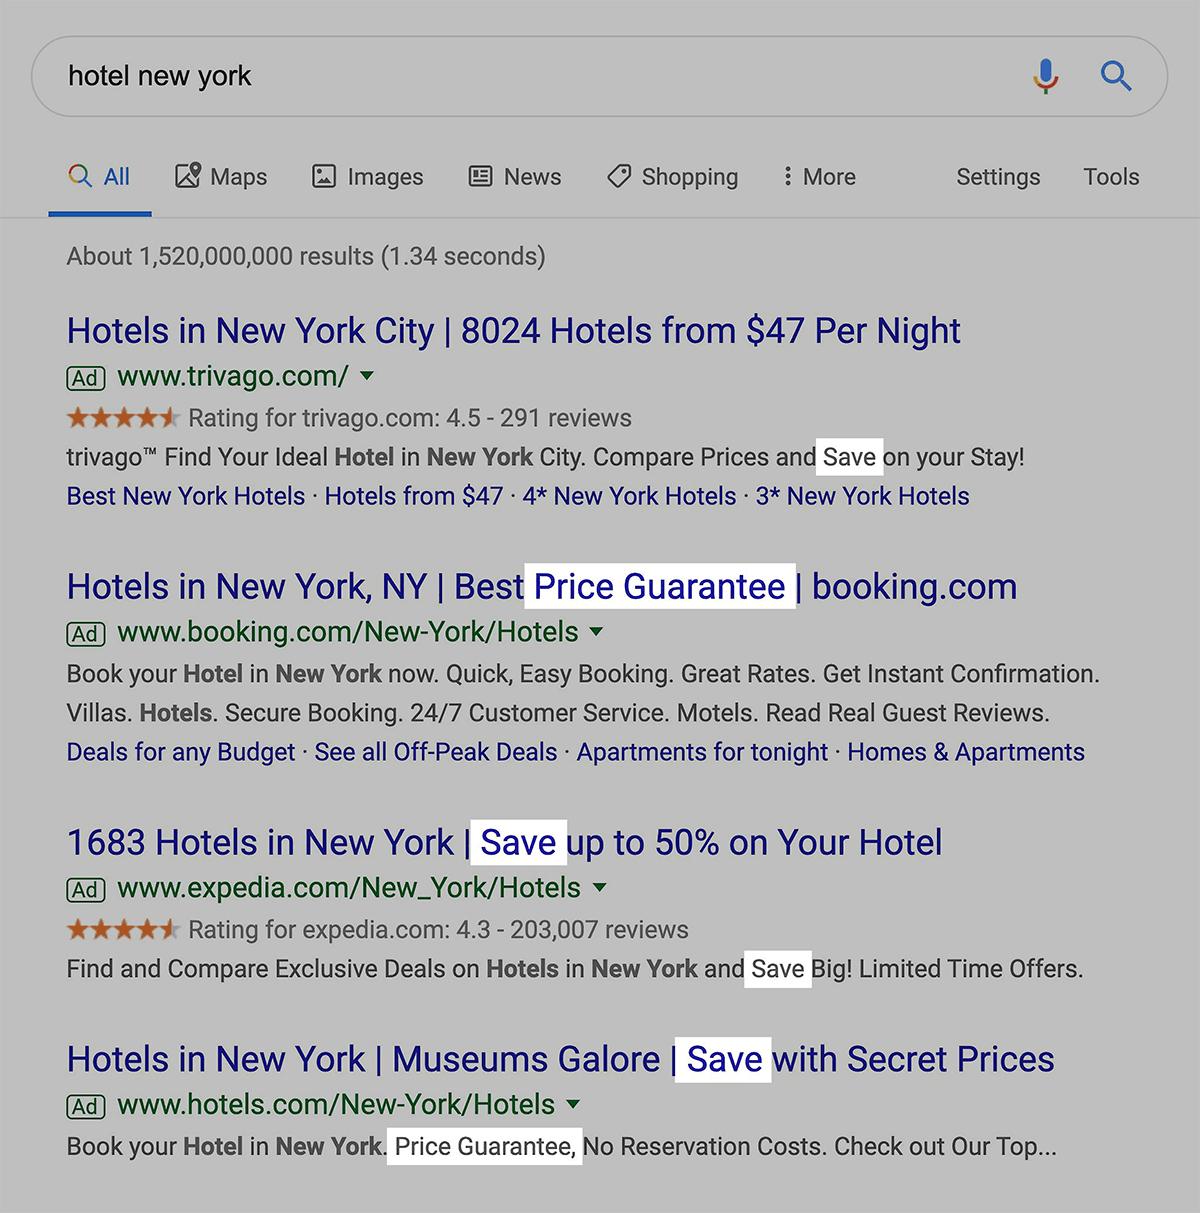 Use Google Ads for description copy